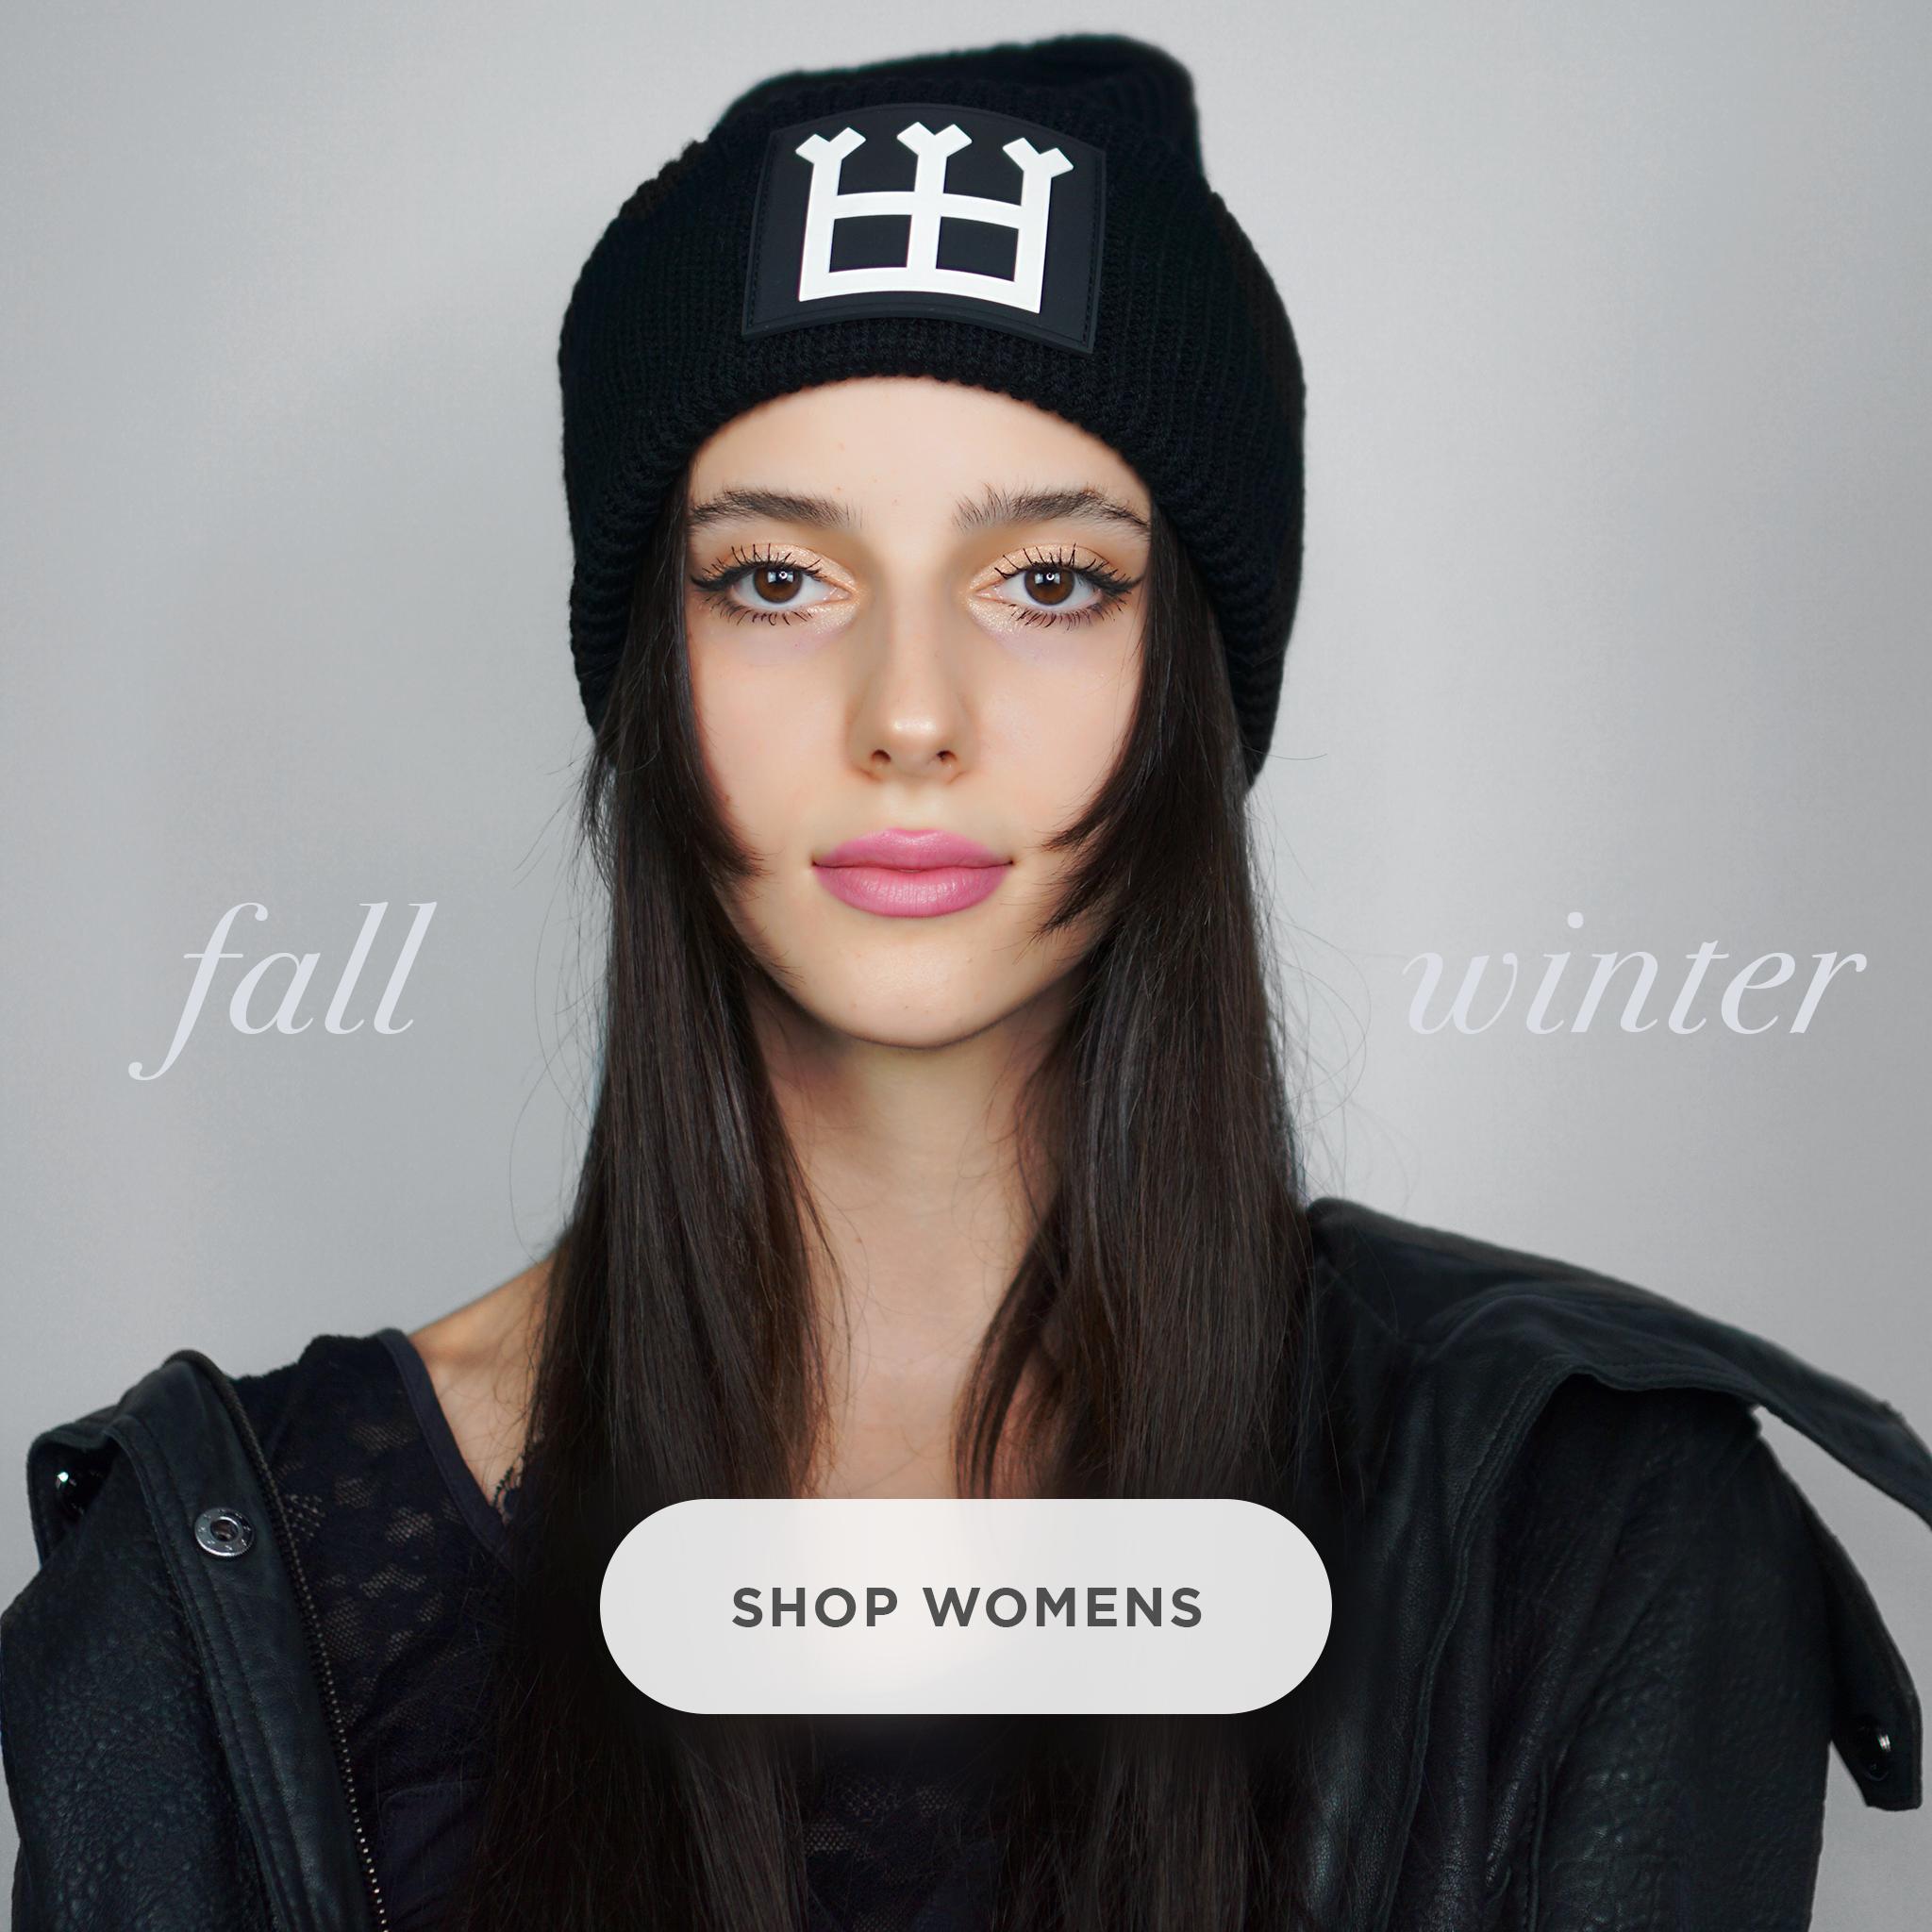 shop-heir-womens.png